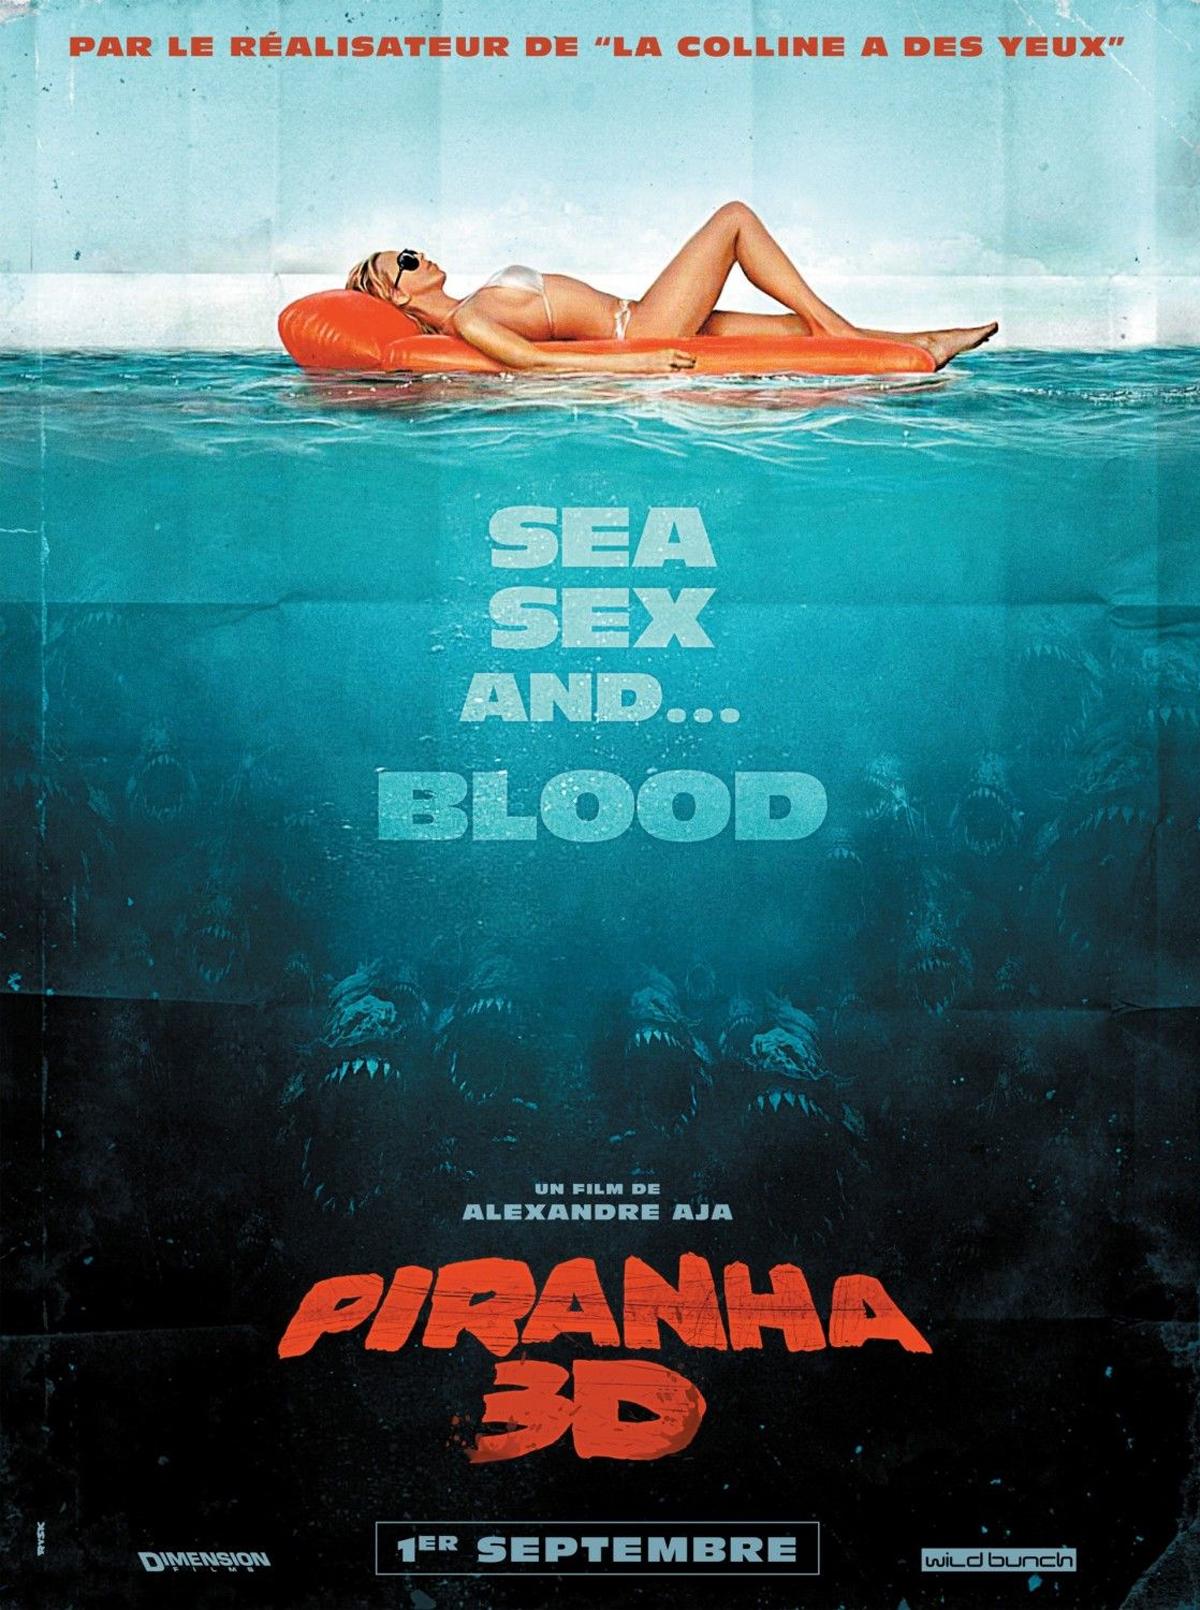 piranha-3d-movie-poster.jpg